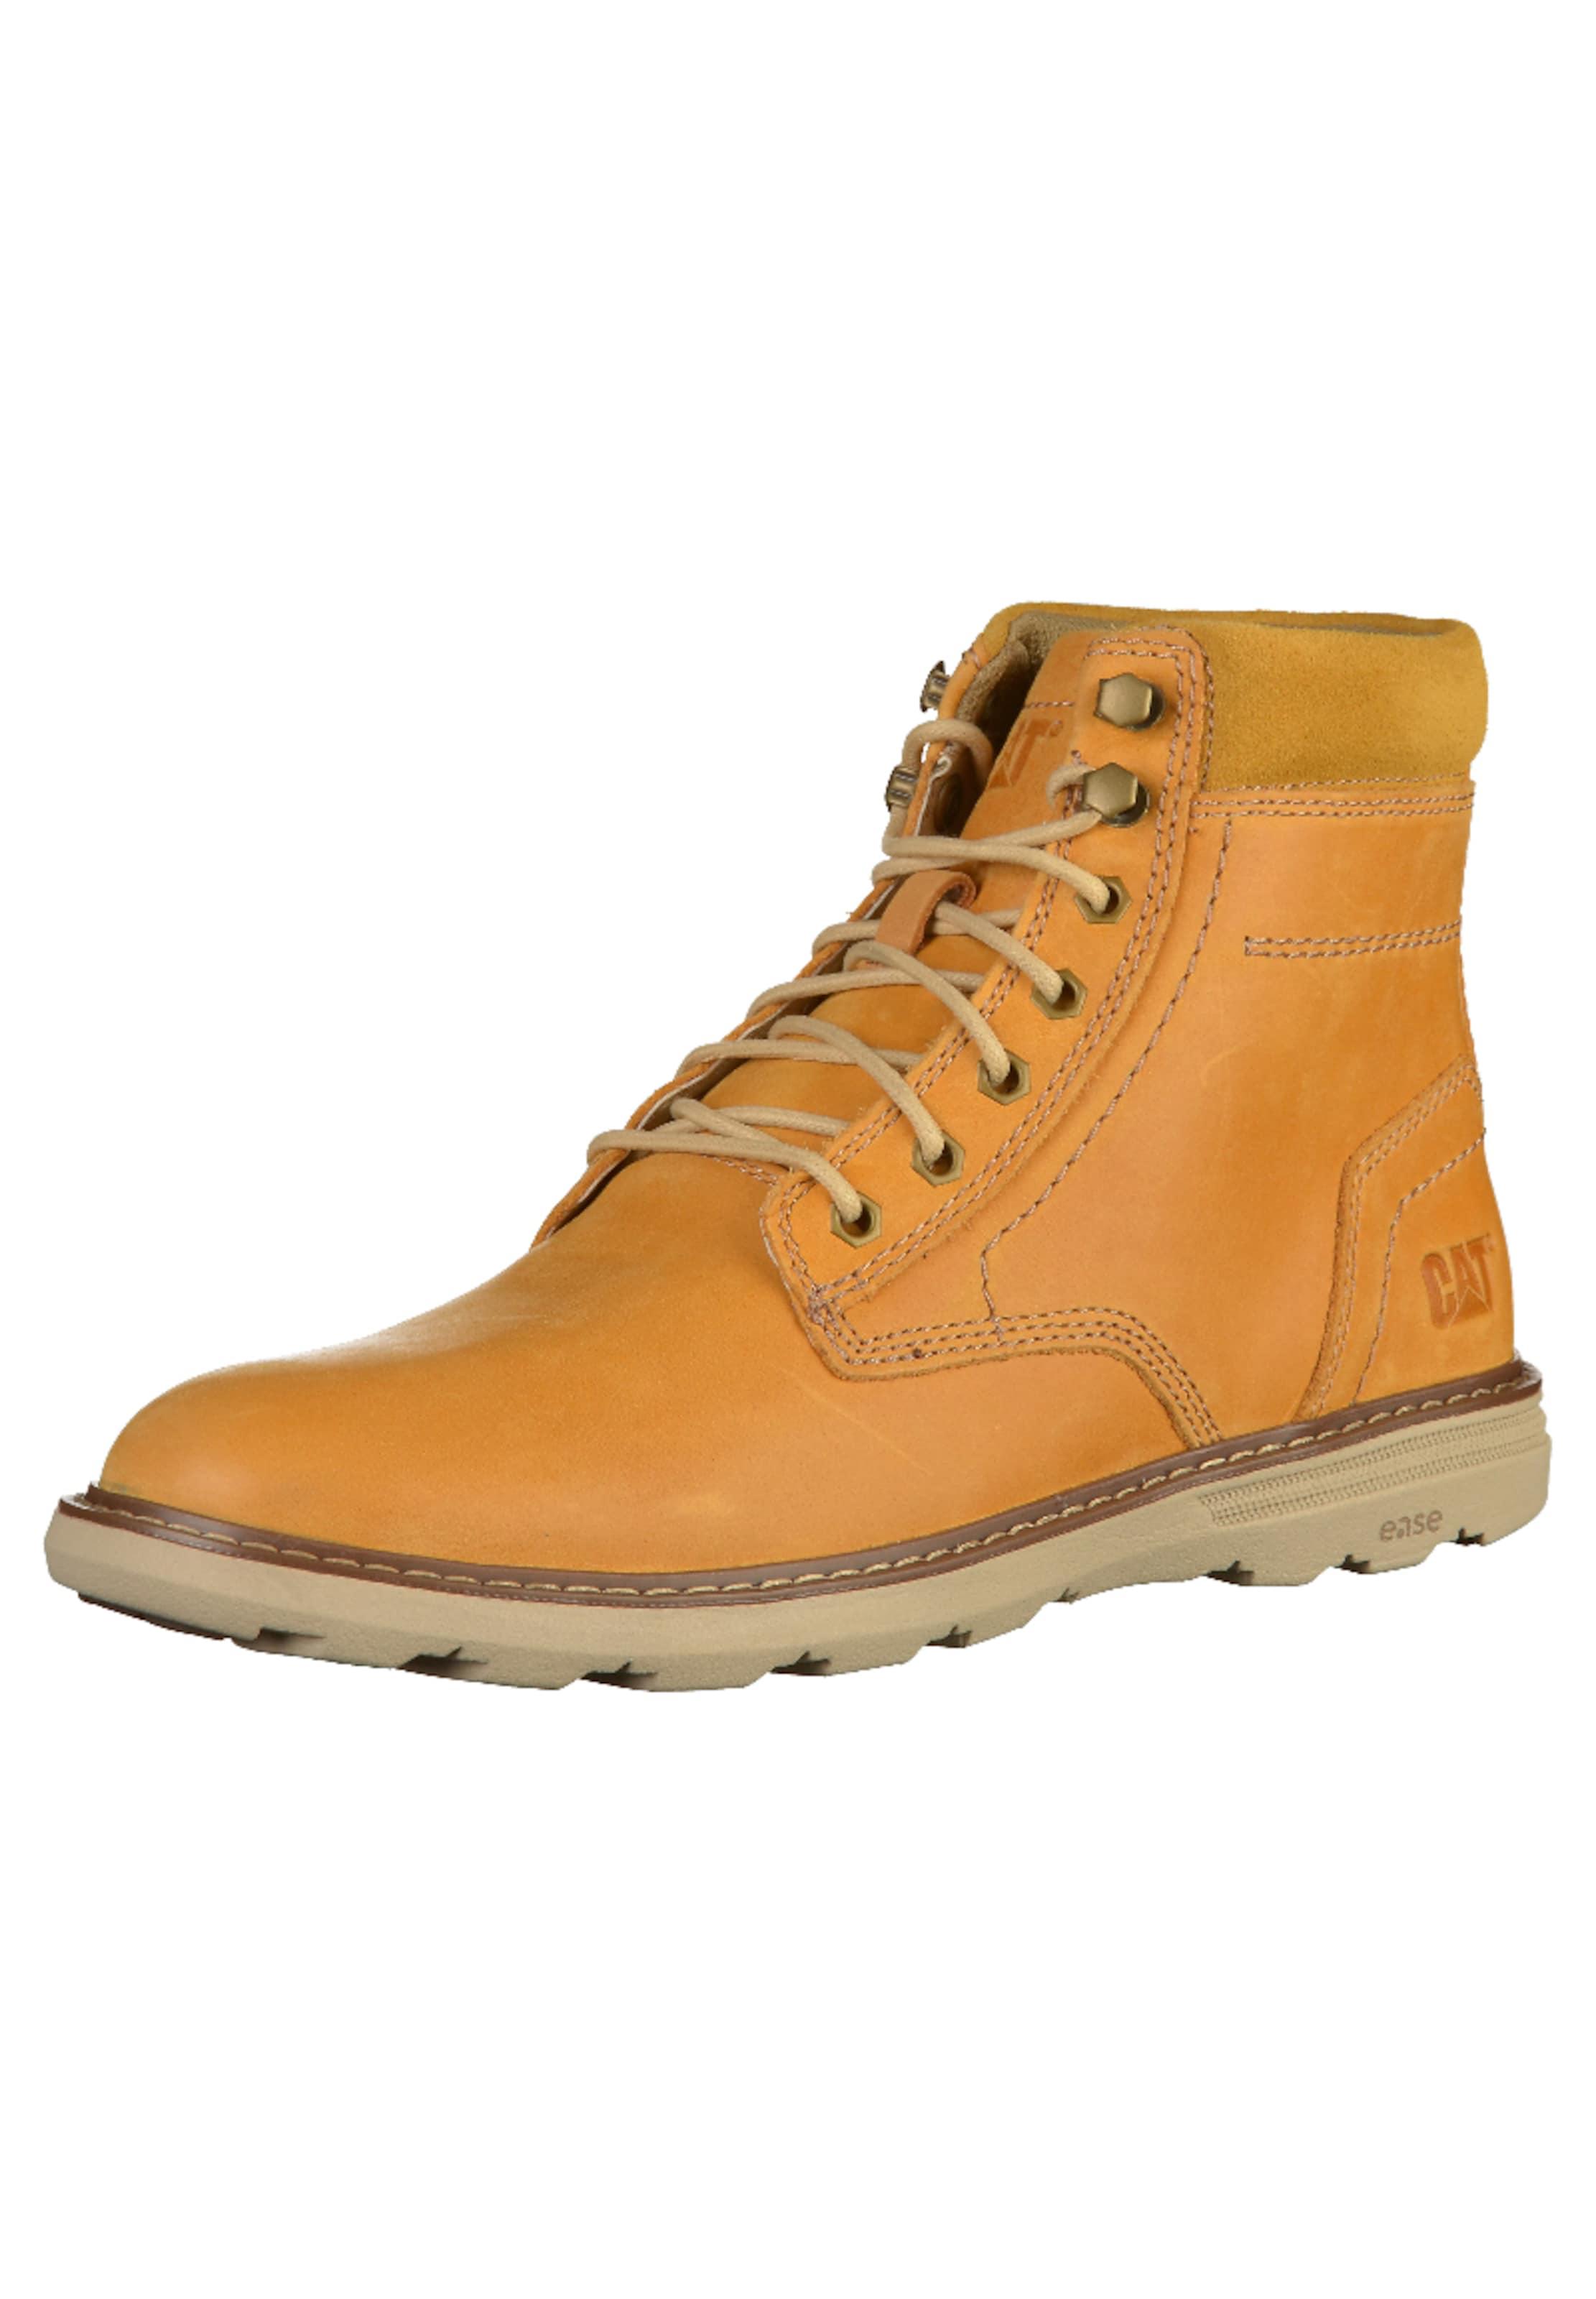 Haltbare Mode billige Schuhe CATERPILLAR   Stiefelette Schuhe Gut Gut Gut getragene Schuhe 069af6